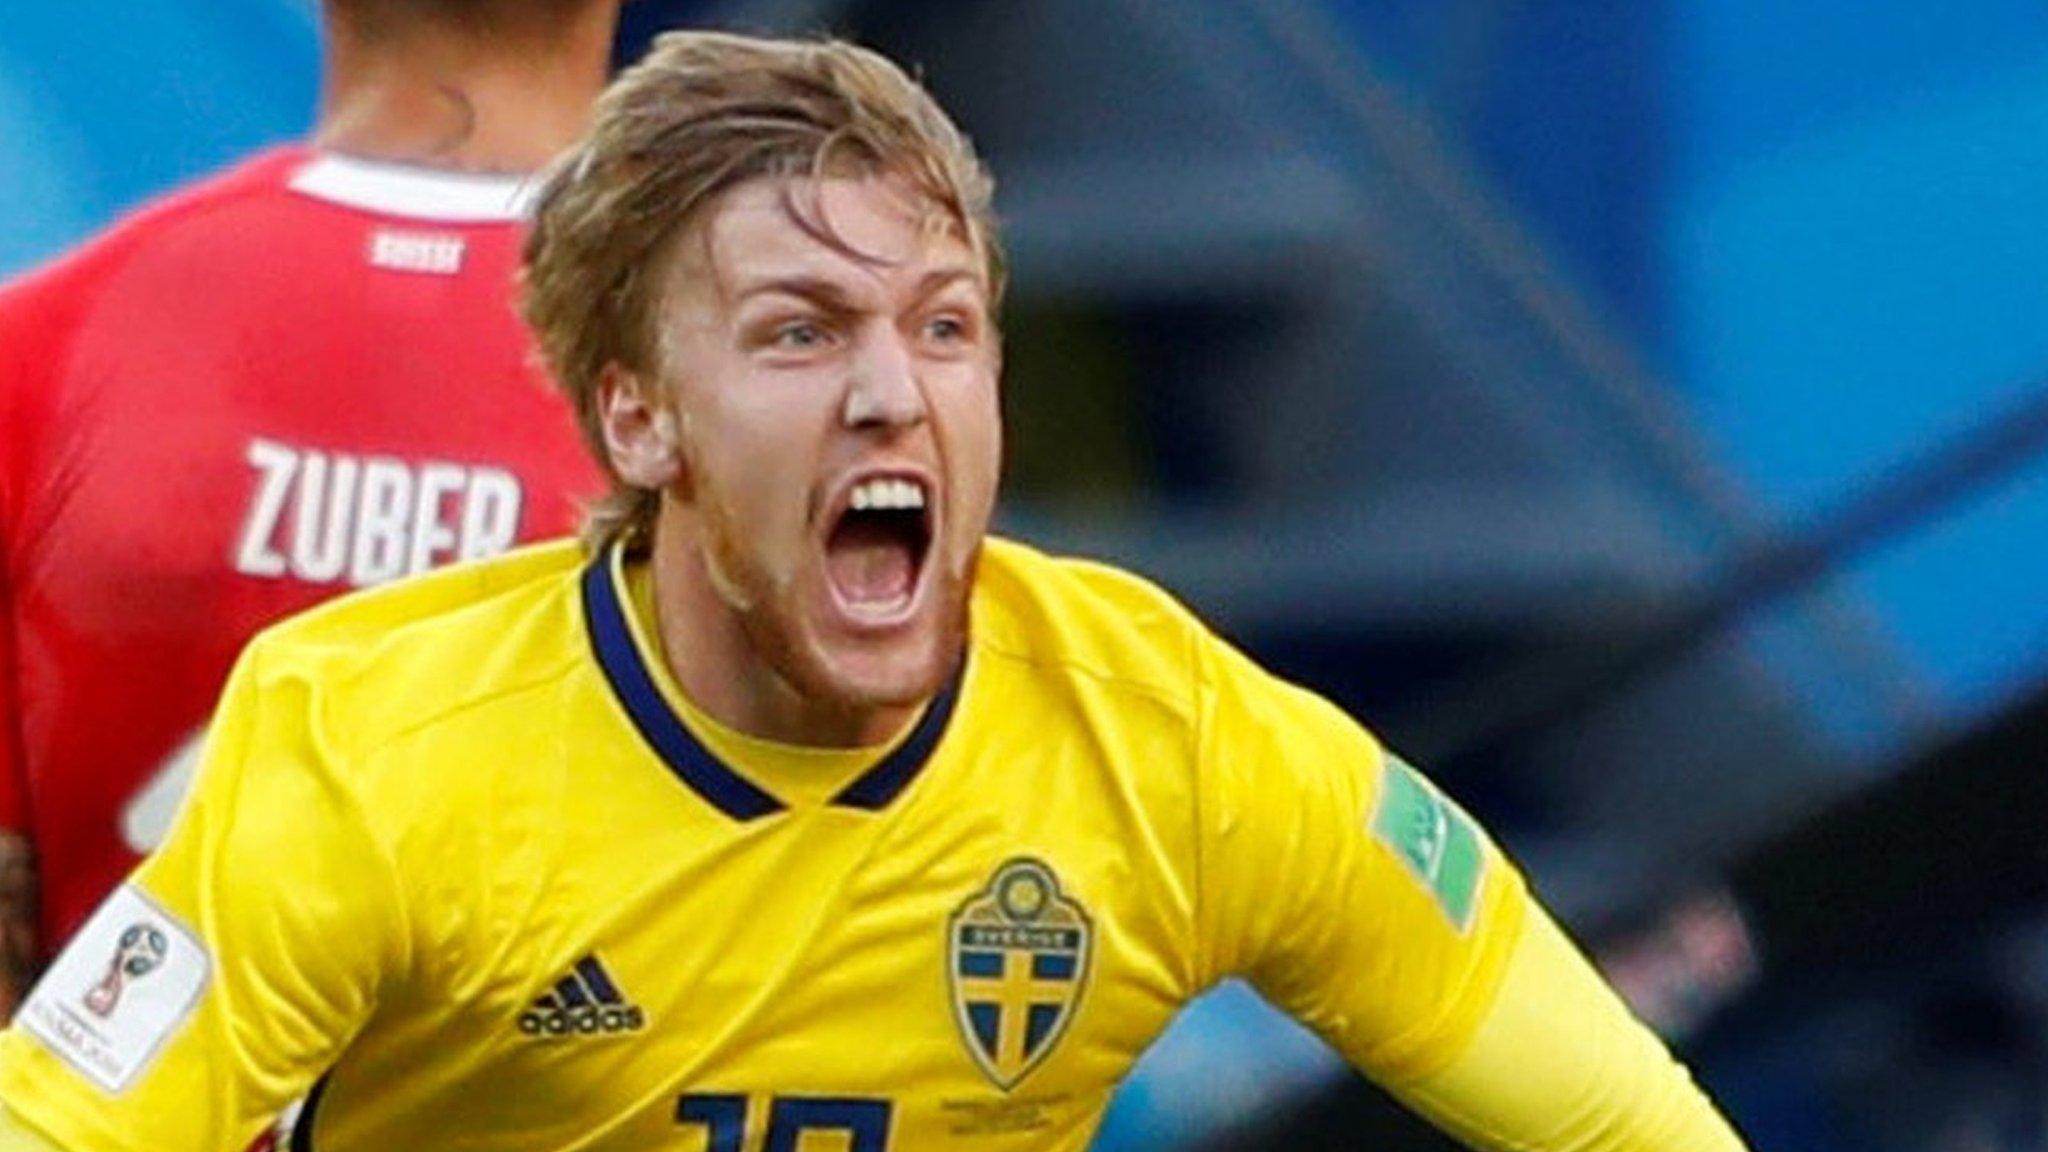 World Cup 2018: Emil Forsberg gives Sweden win over Switzerland